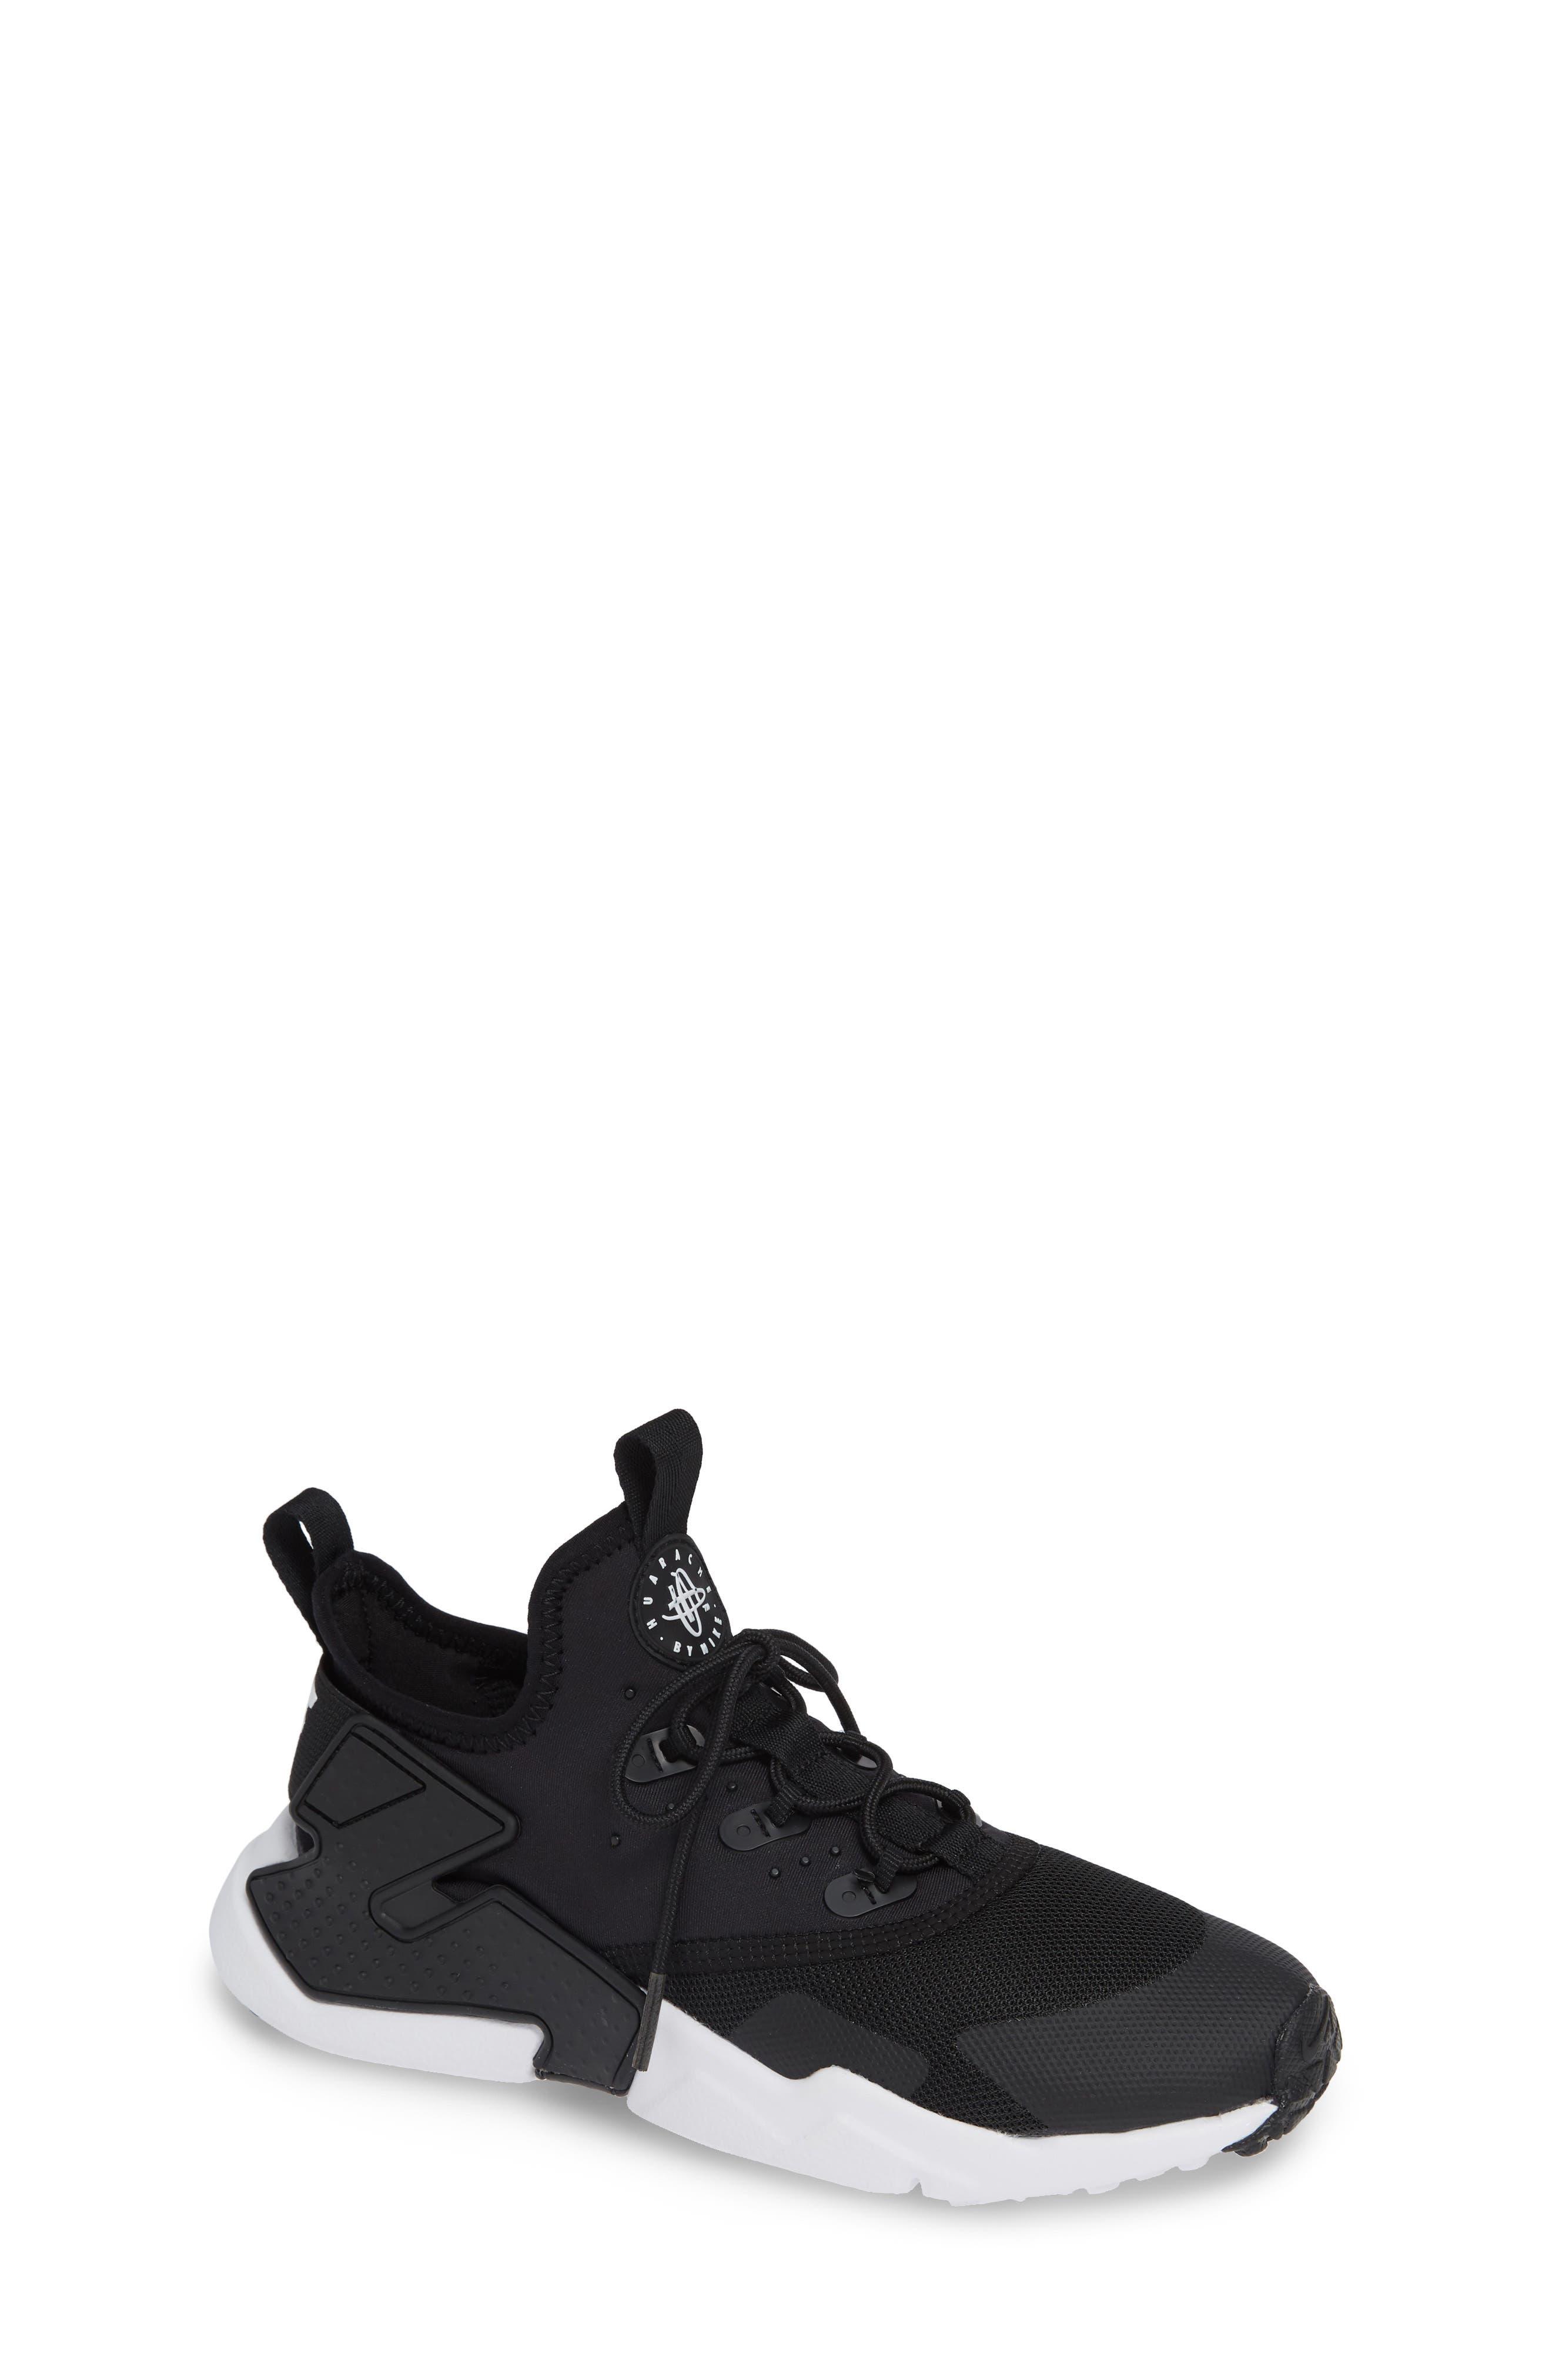 Huarache Run Drift Sneaker,                         Main,                         color, Black/ Anthracite